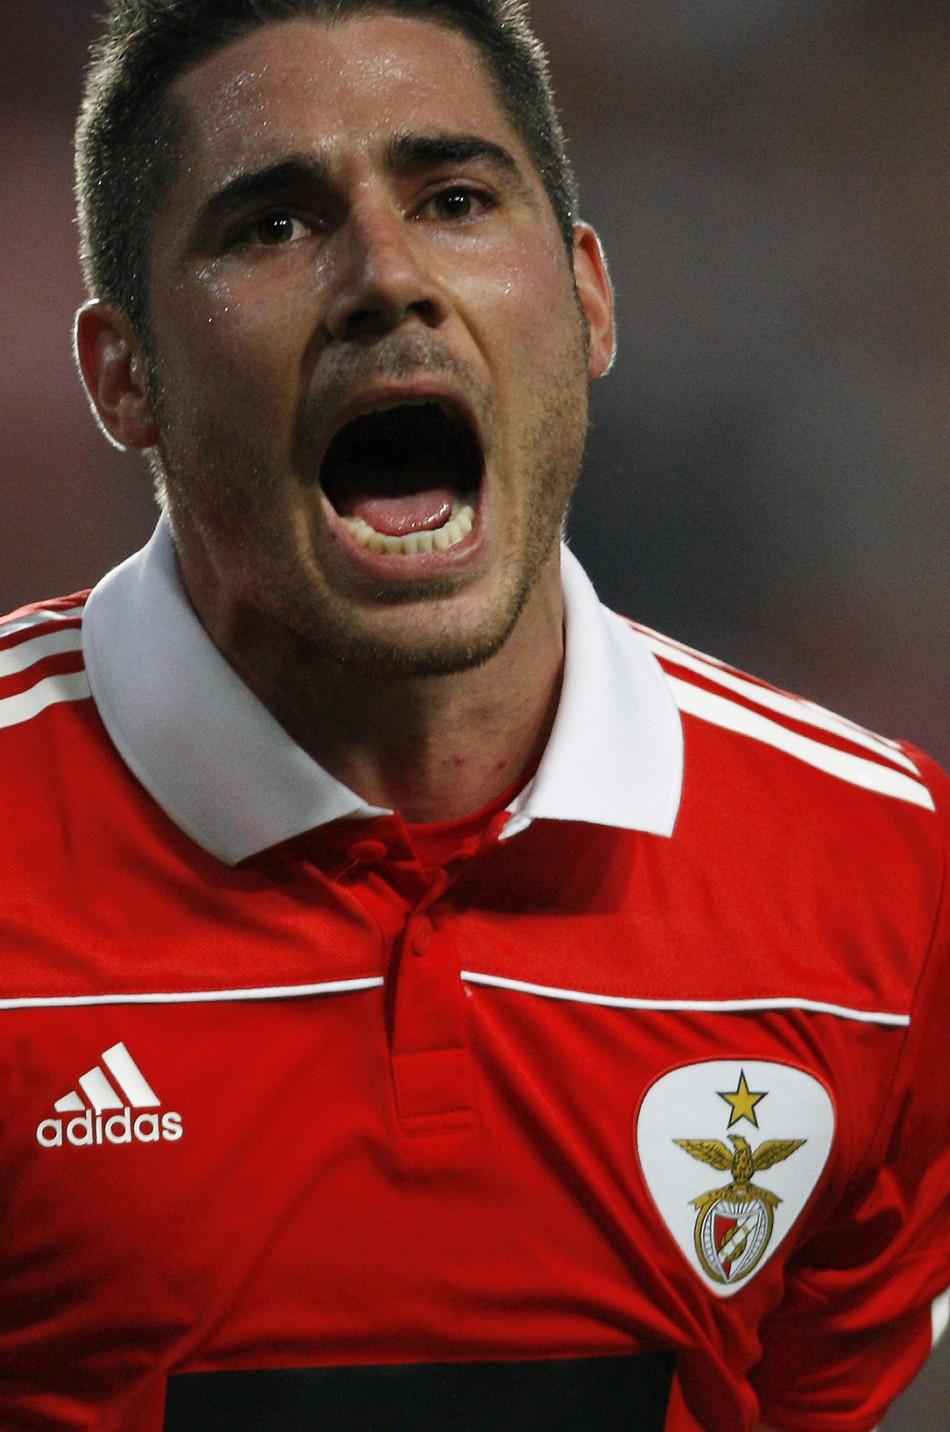 Benfica's Javi Garcia